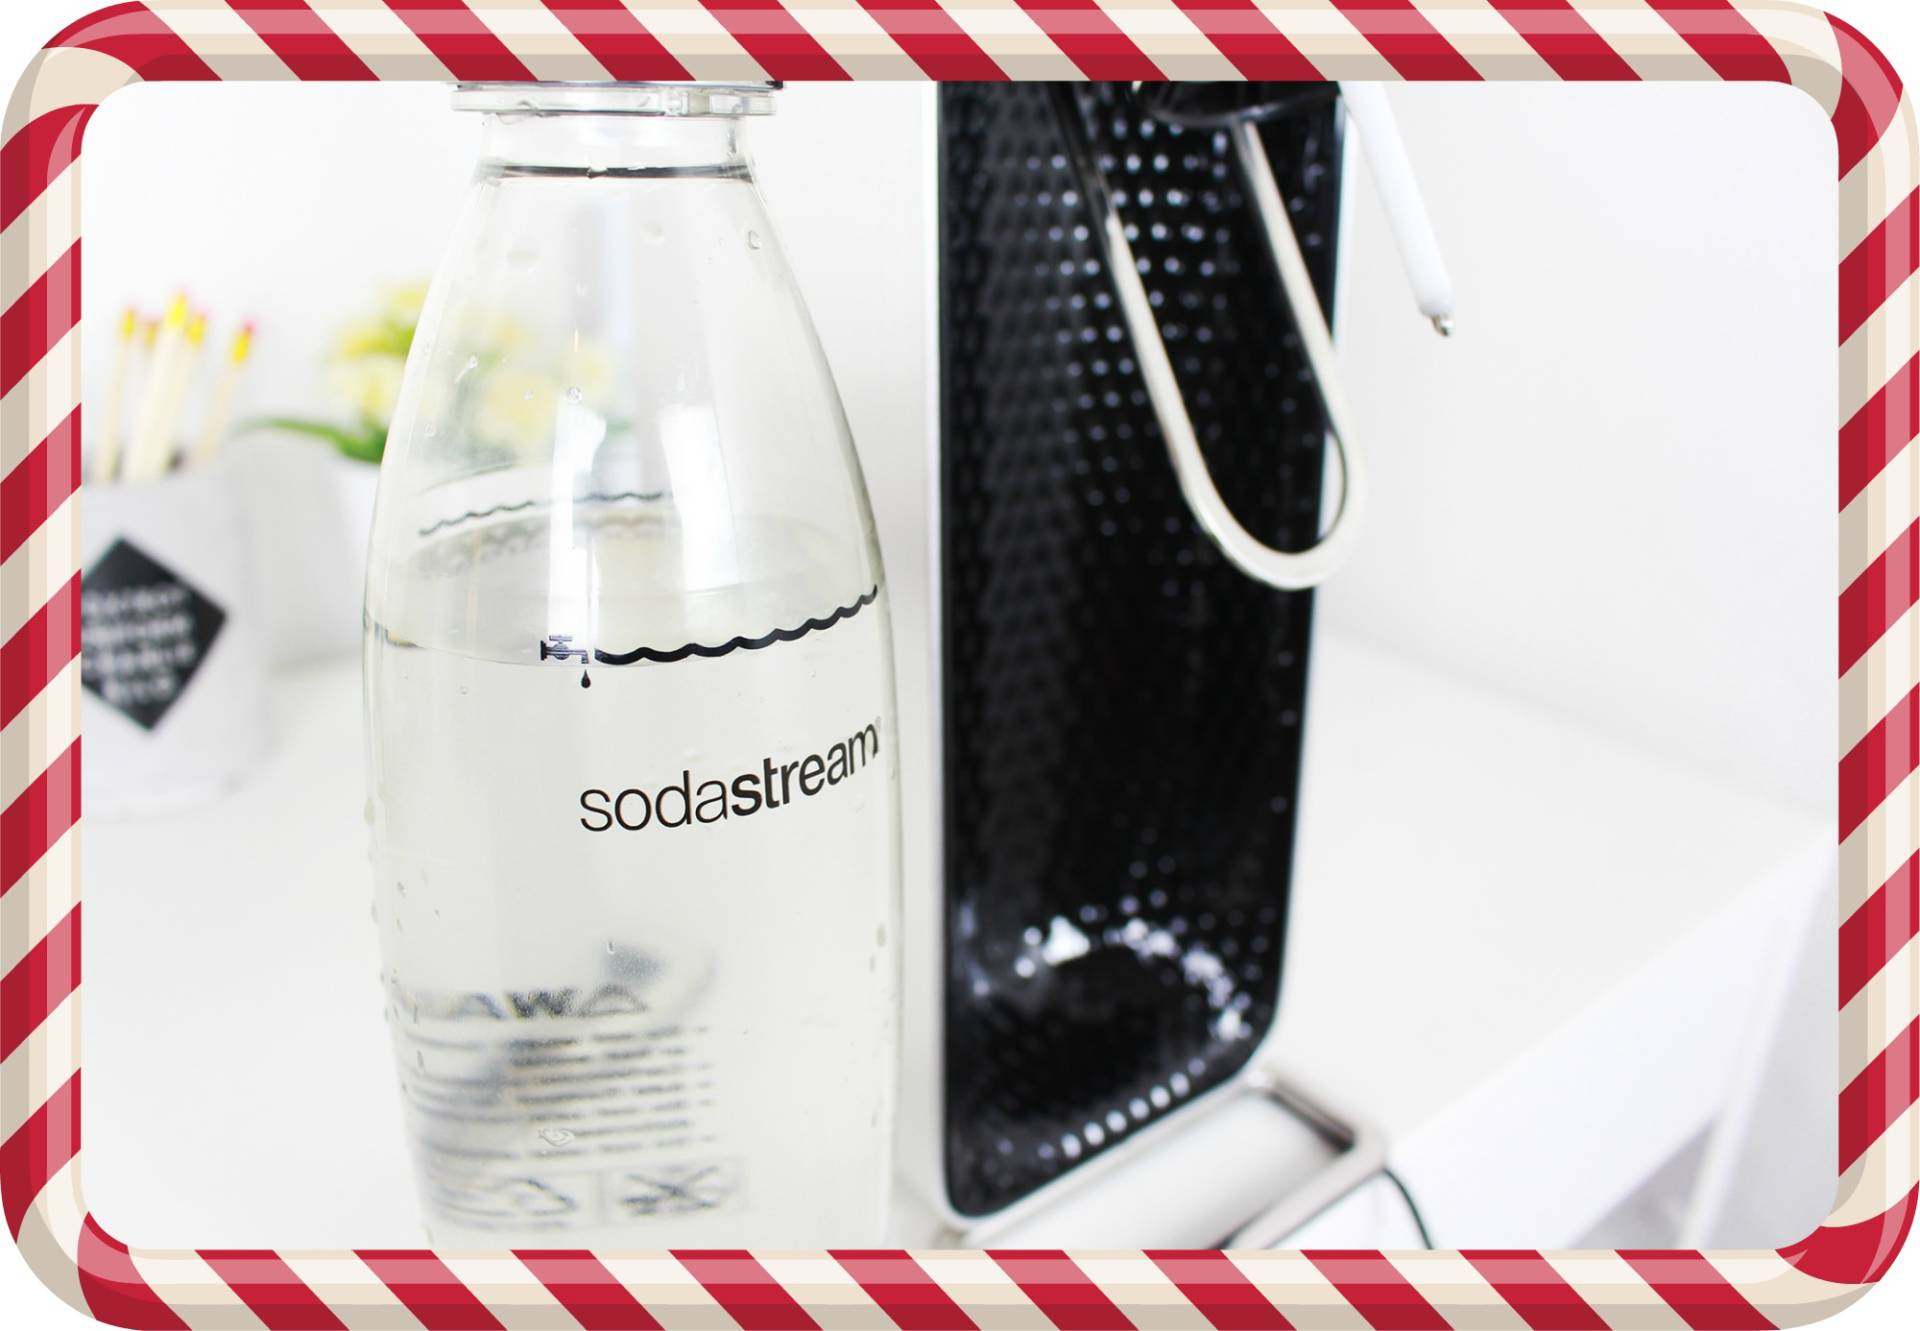 sodastream-4